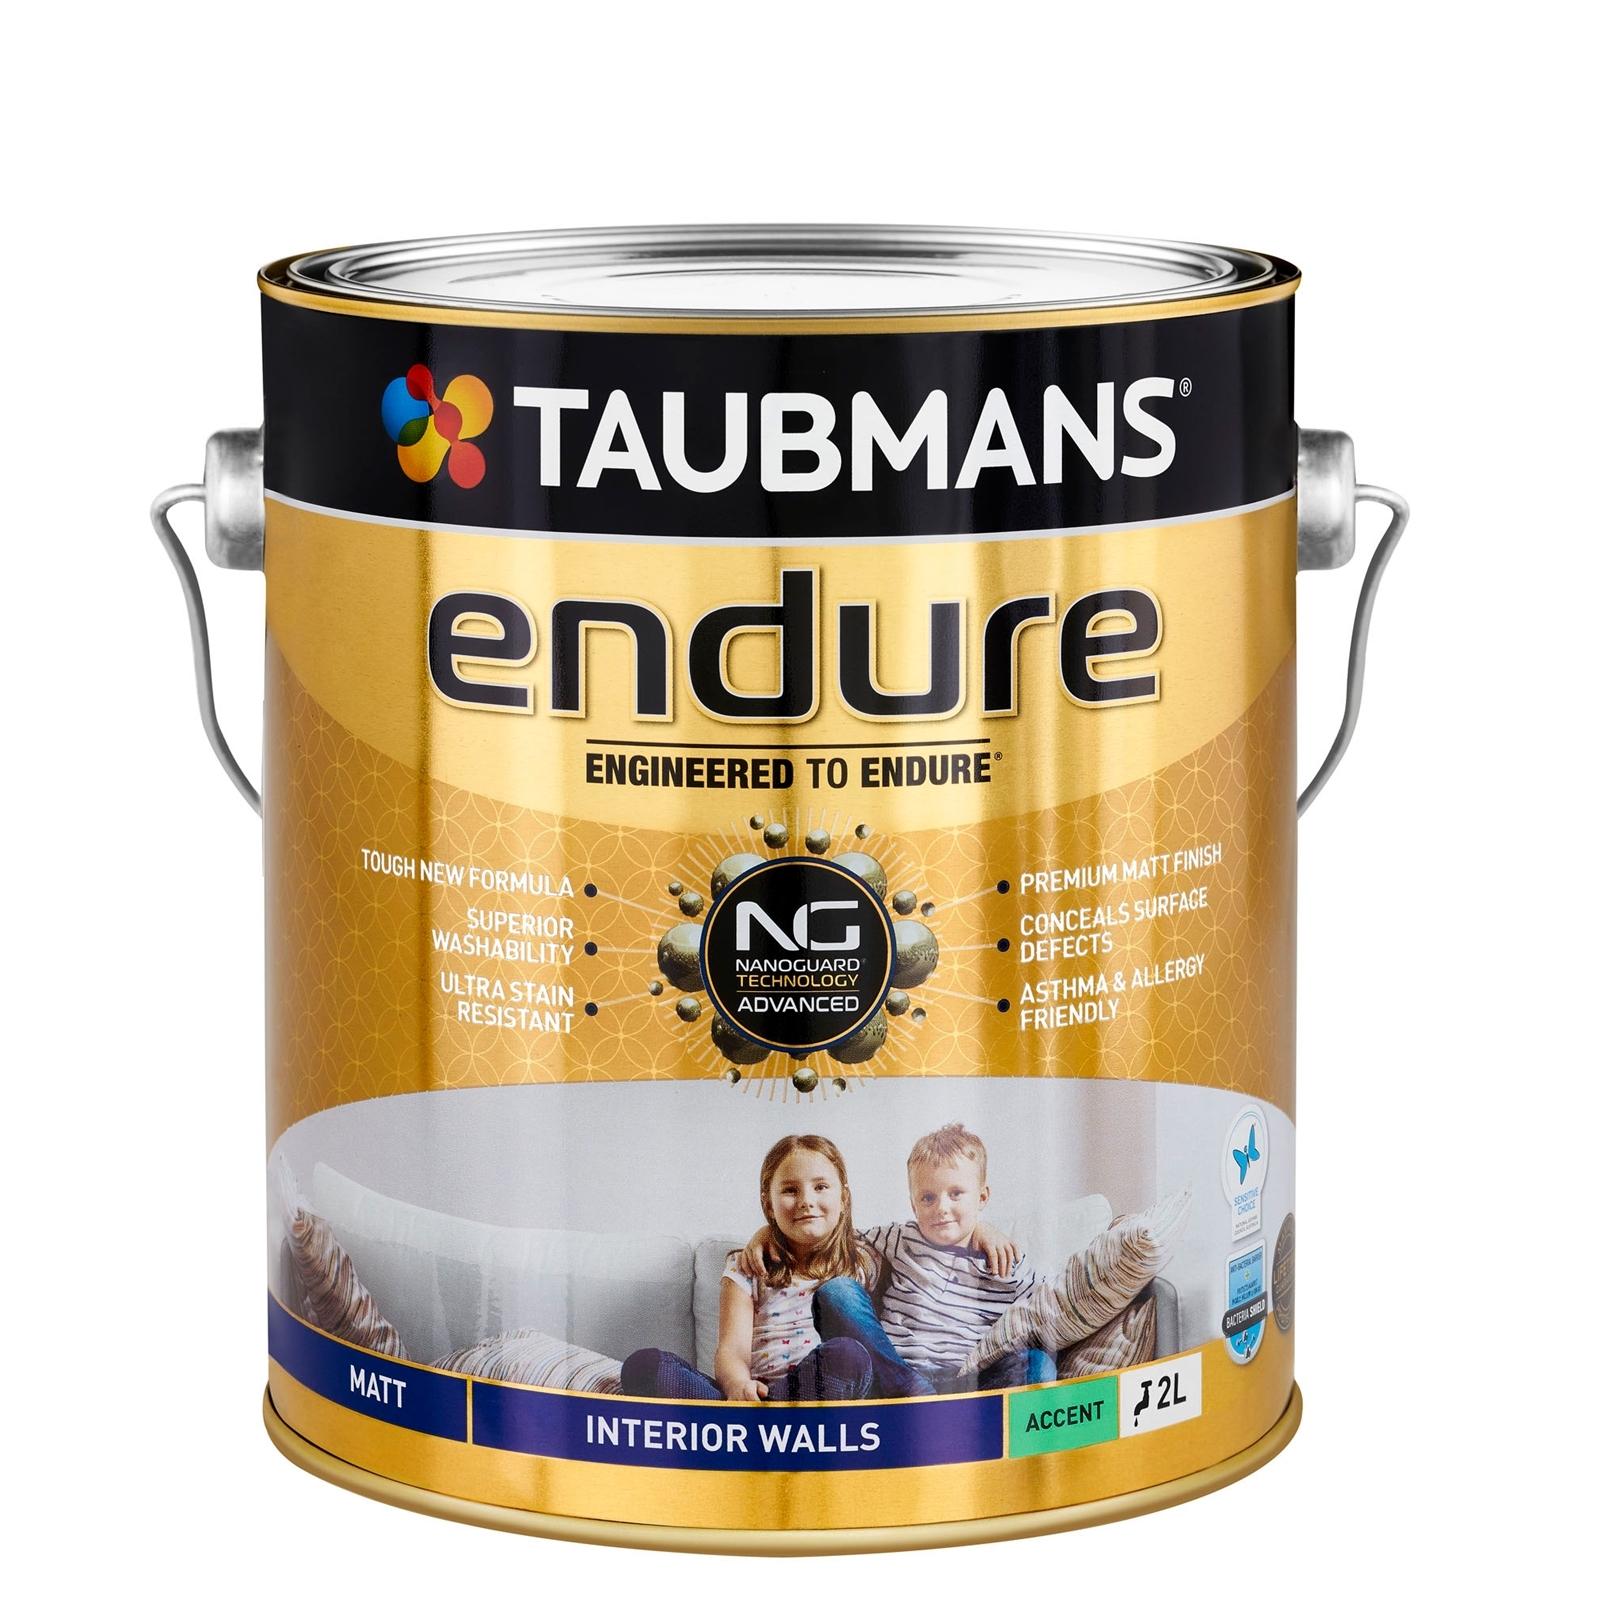 Taubmans Endure Matt Accent Interior Wall Paint - 2L